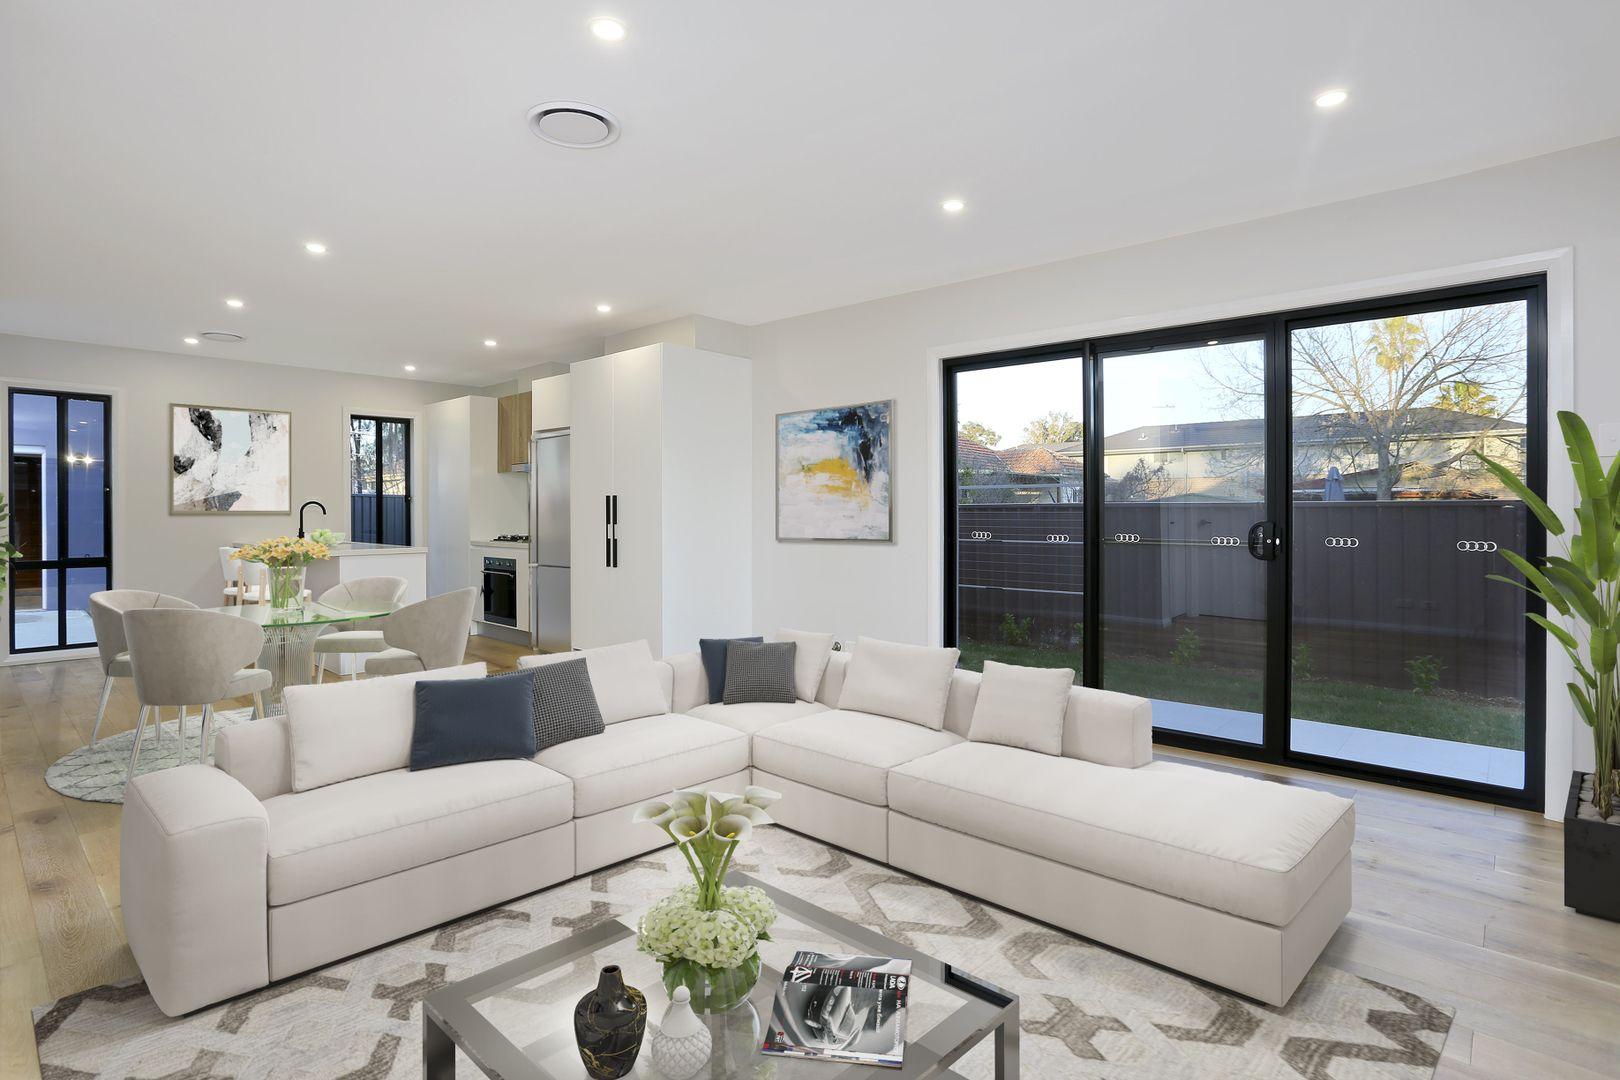 4/32-34 Lethbridge Avenue, Werrington NSW 2747, Image 2